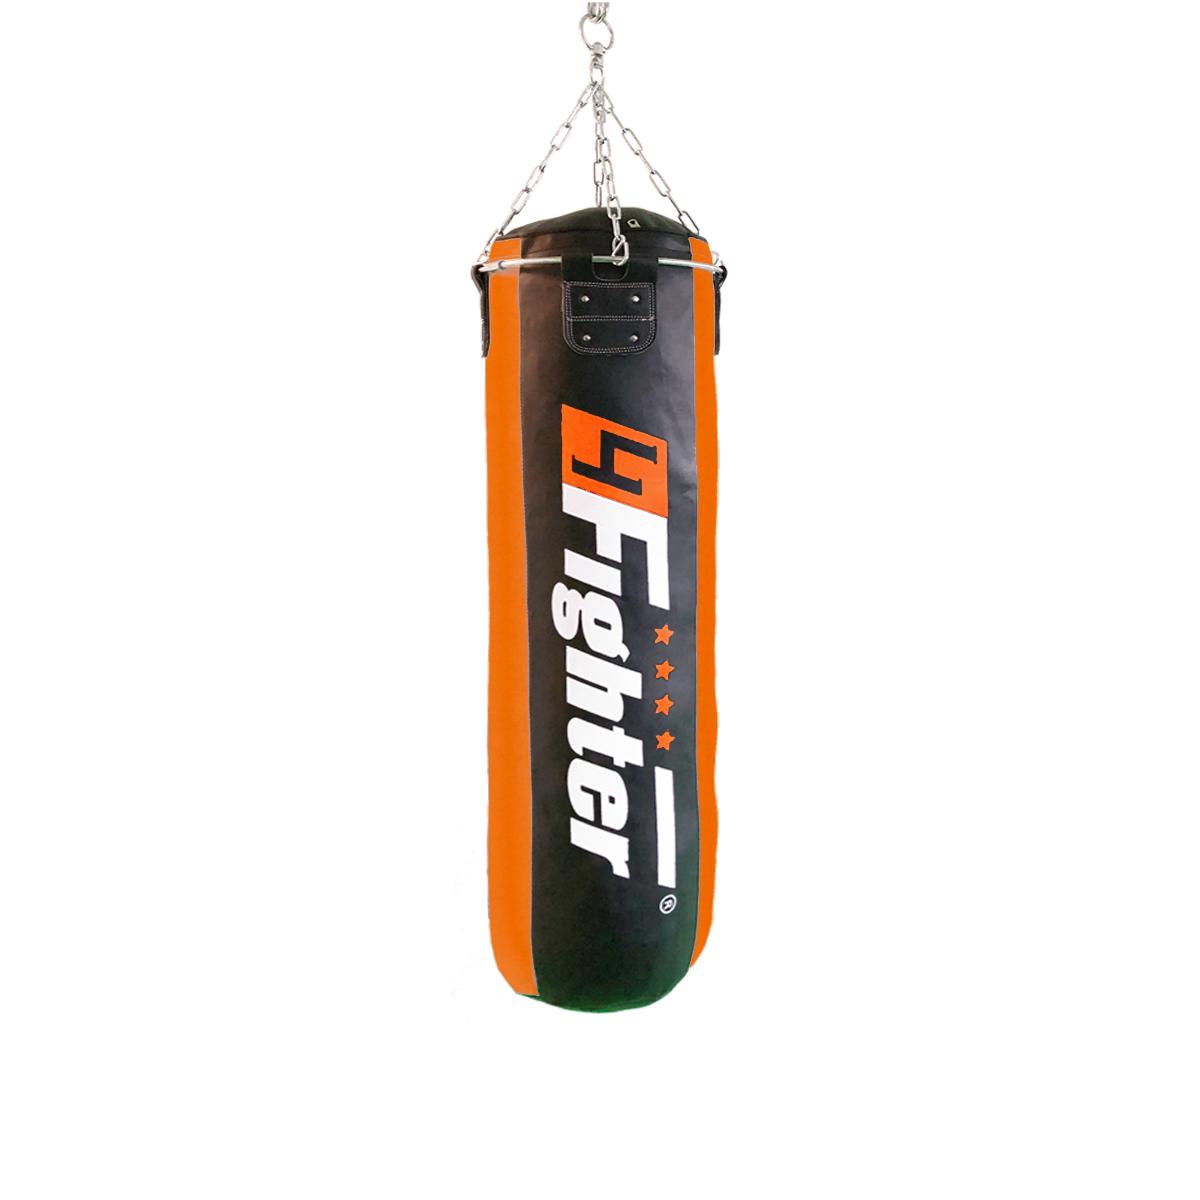 4Fighter Profi Kunstleder Boxsack / Sandsack - schwarz/orange, ungefüllt 180cm